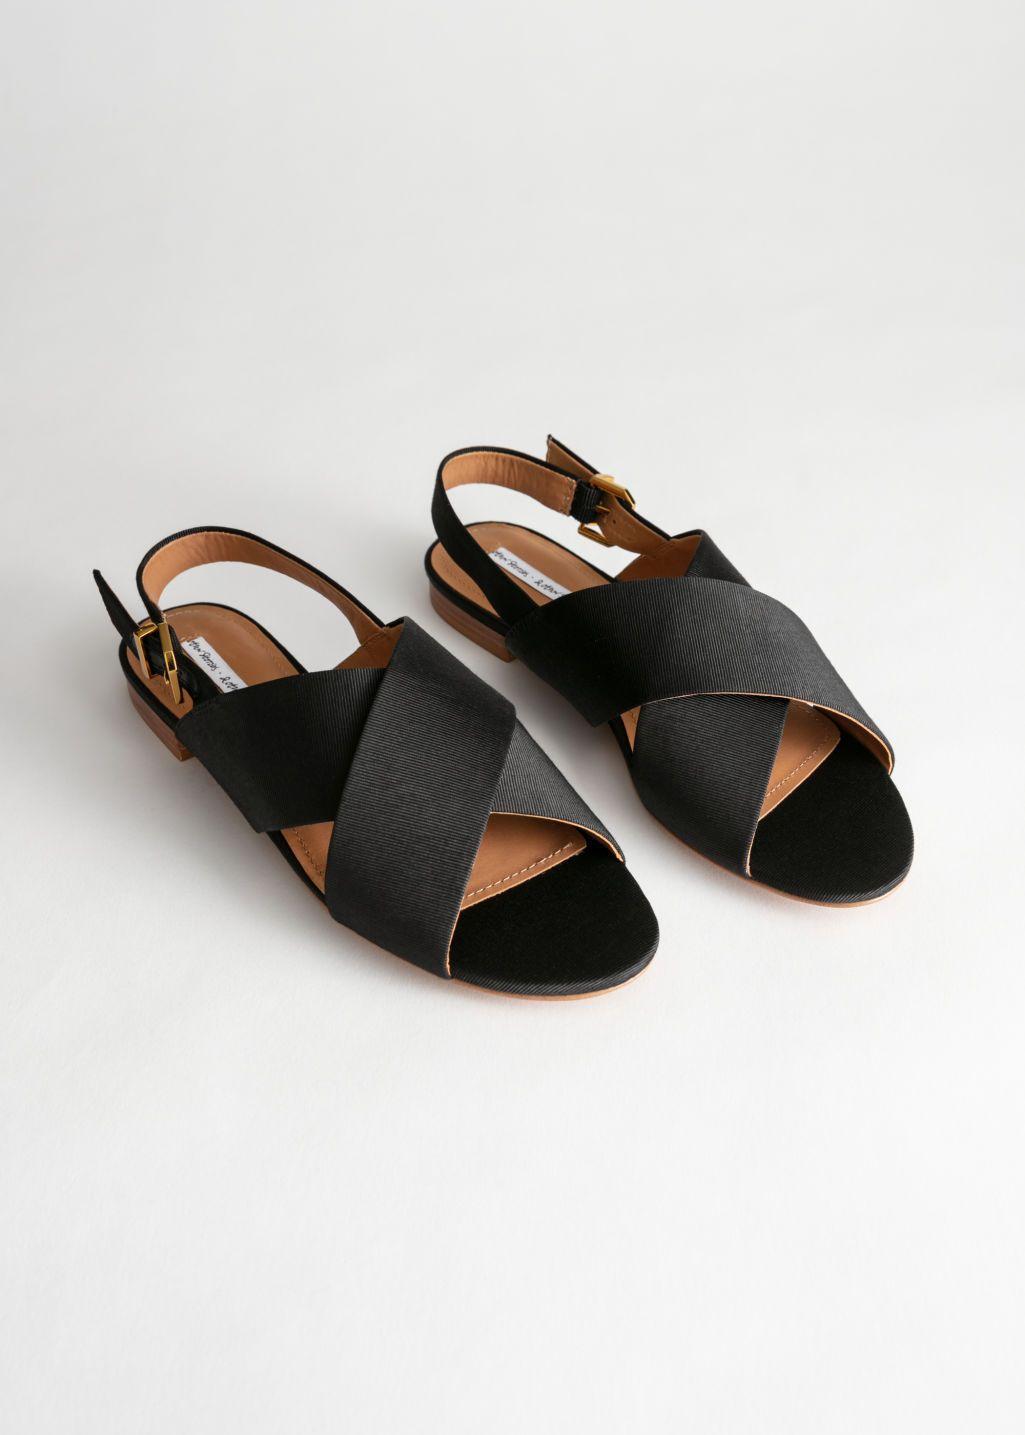 866eafdf0481 Criss Cross Slingback Sandals - Black - Flat sandals -   Other Stories